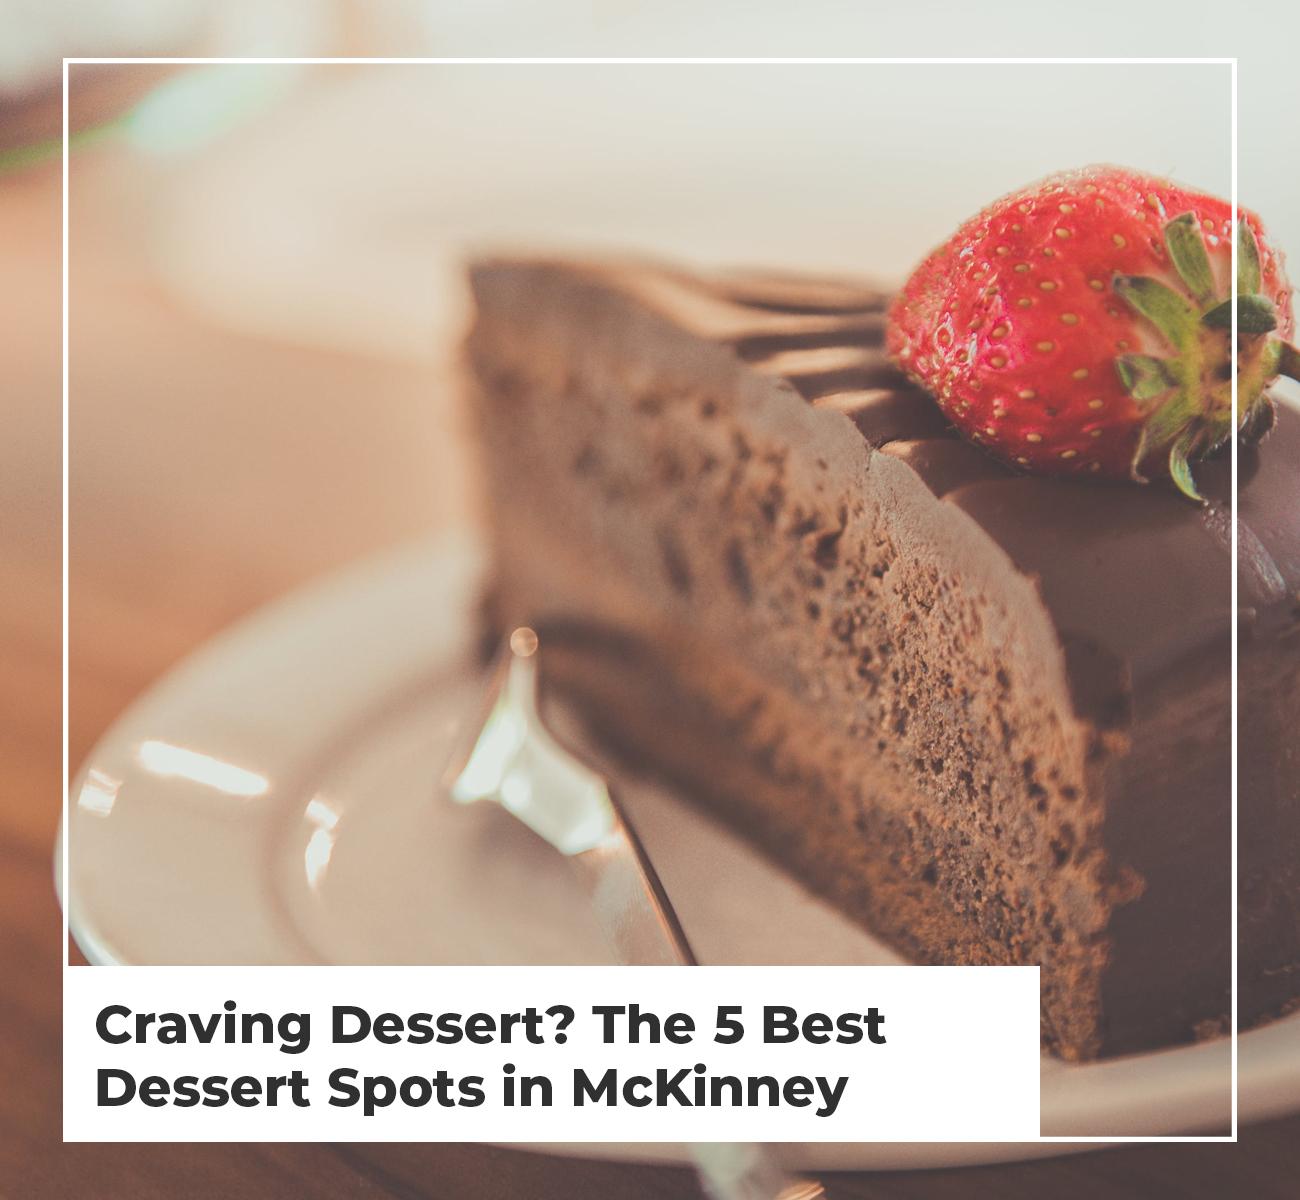 Dessert Spots in Mckinney